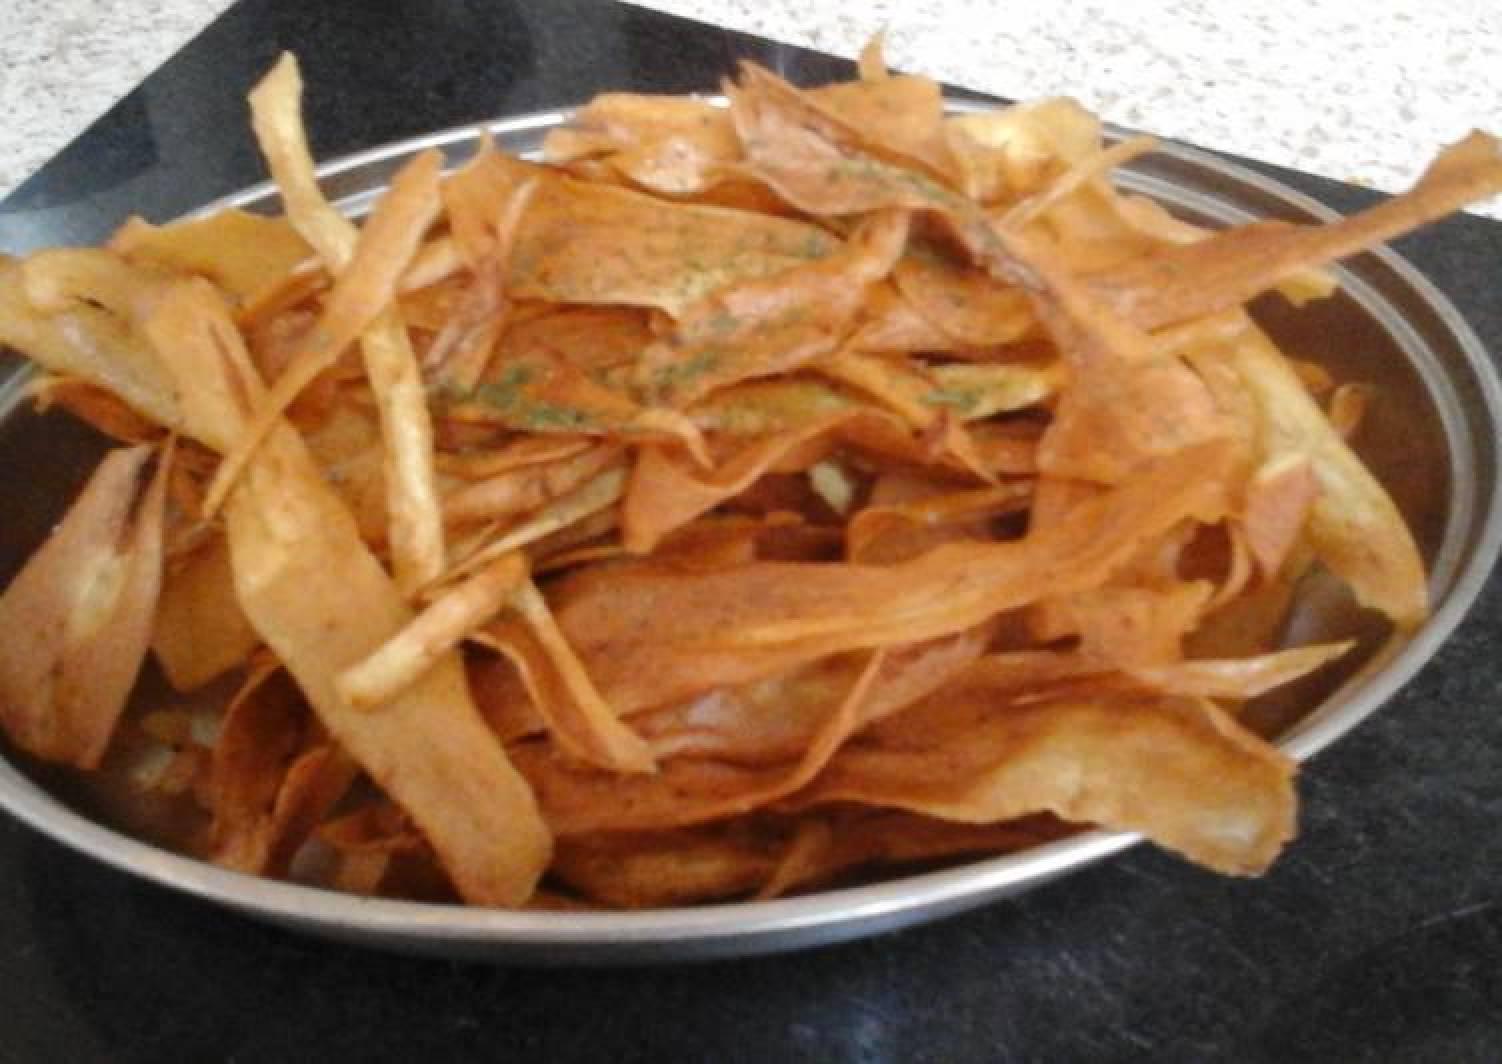 My Deep Fried Parsnip Crisp